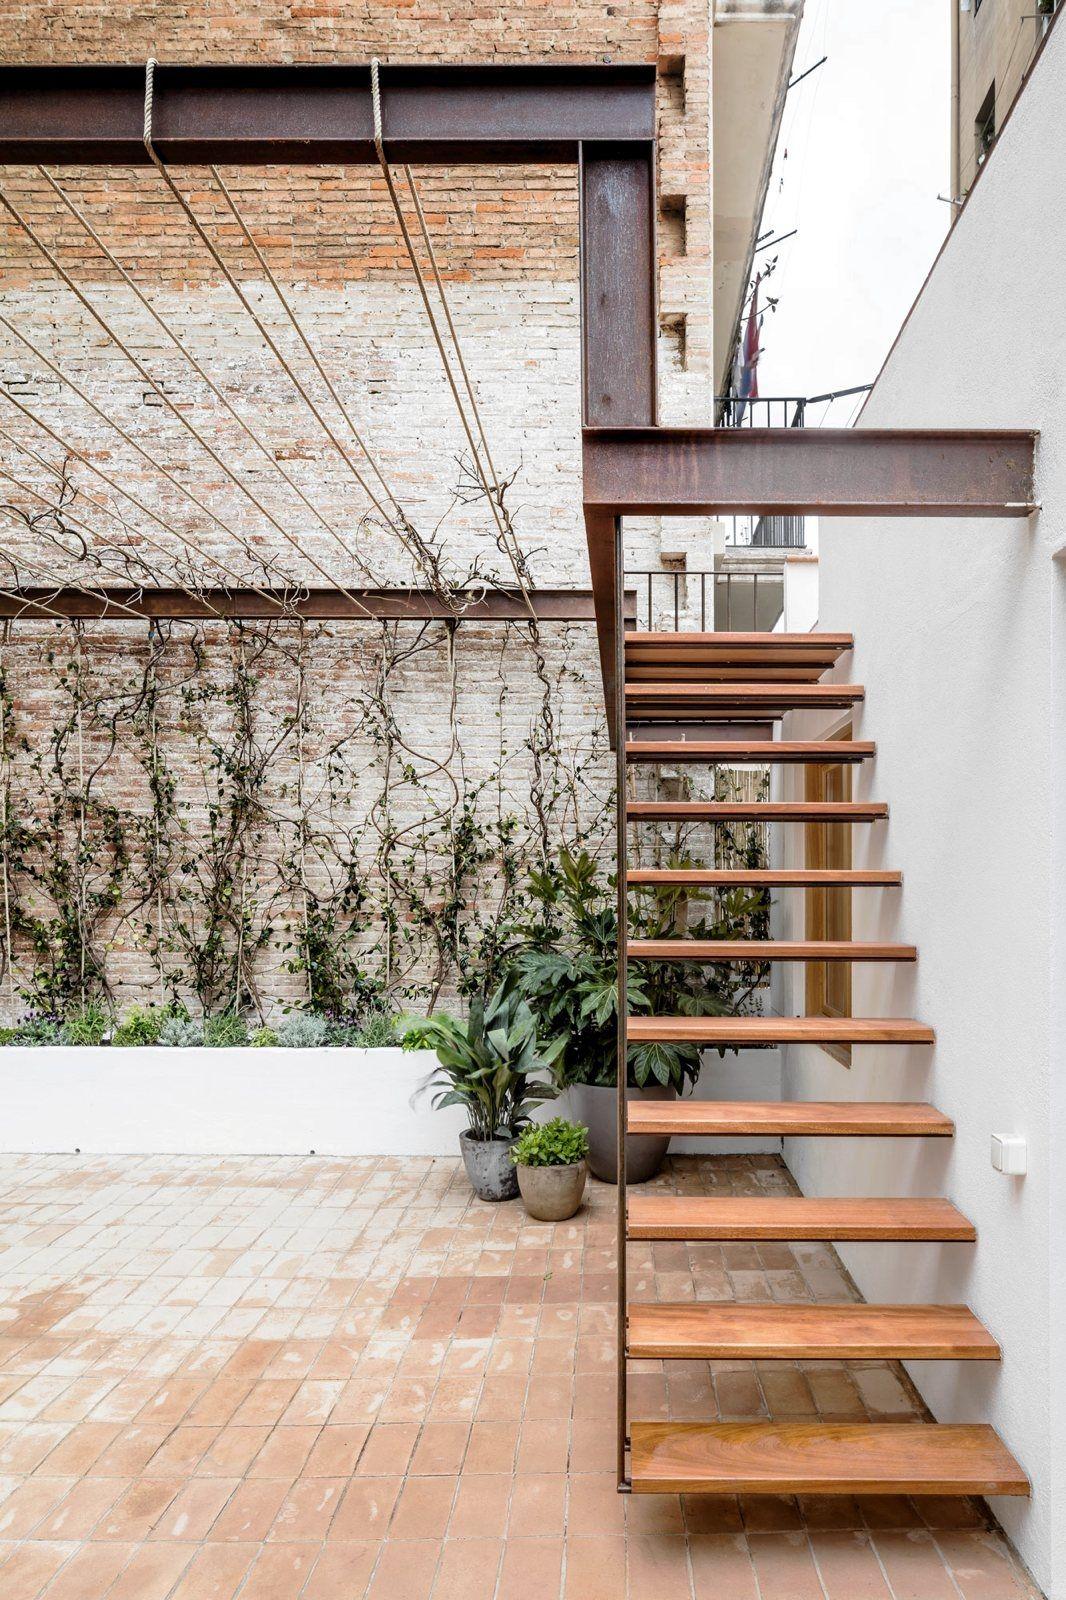 Industrial Pergola Stairway Ga Upinteriors Ello Stairs Design Exterior Stairs Outdoor Stairs